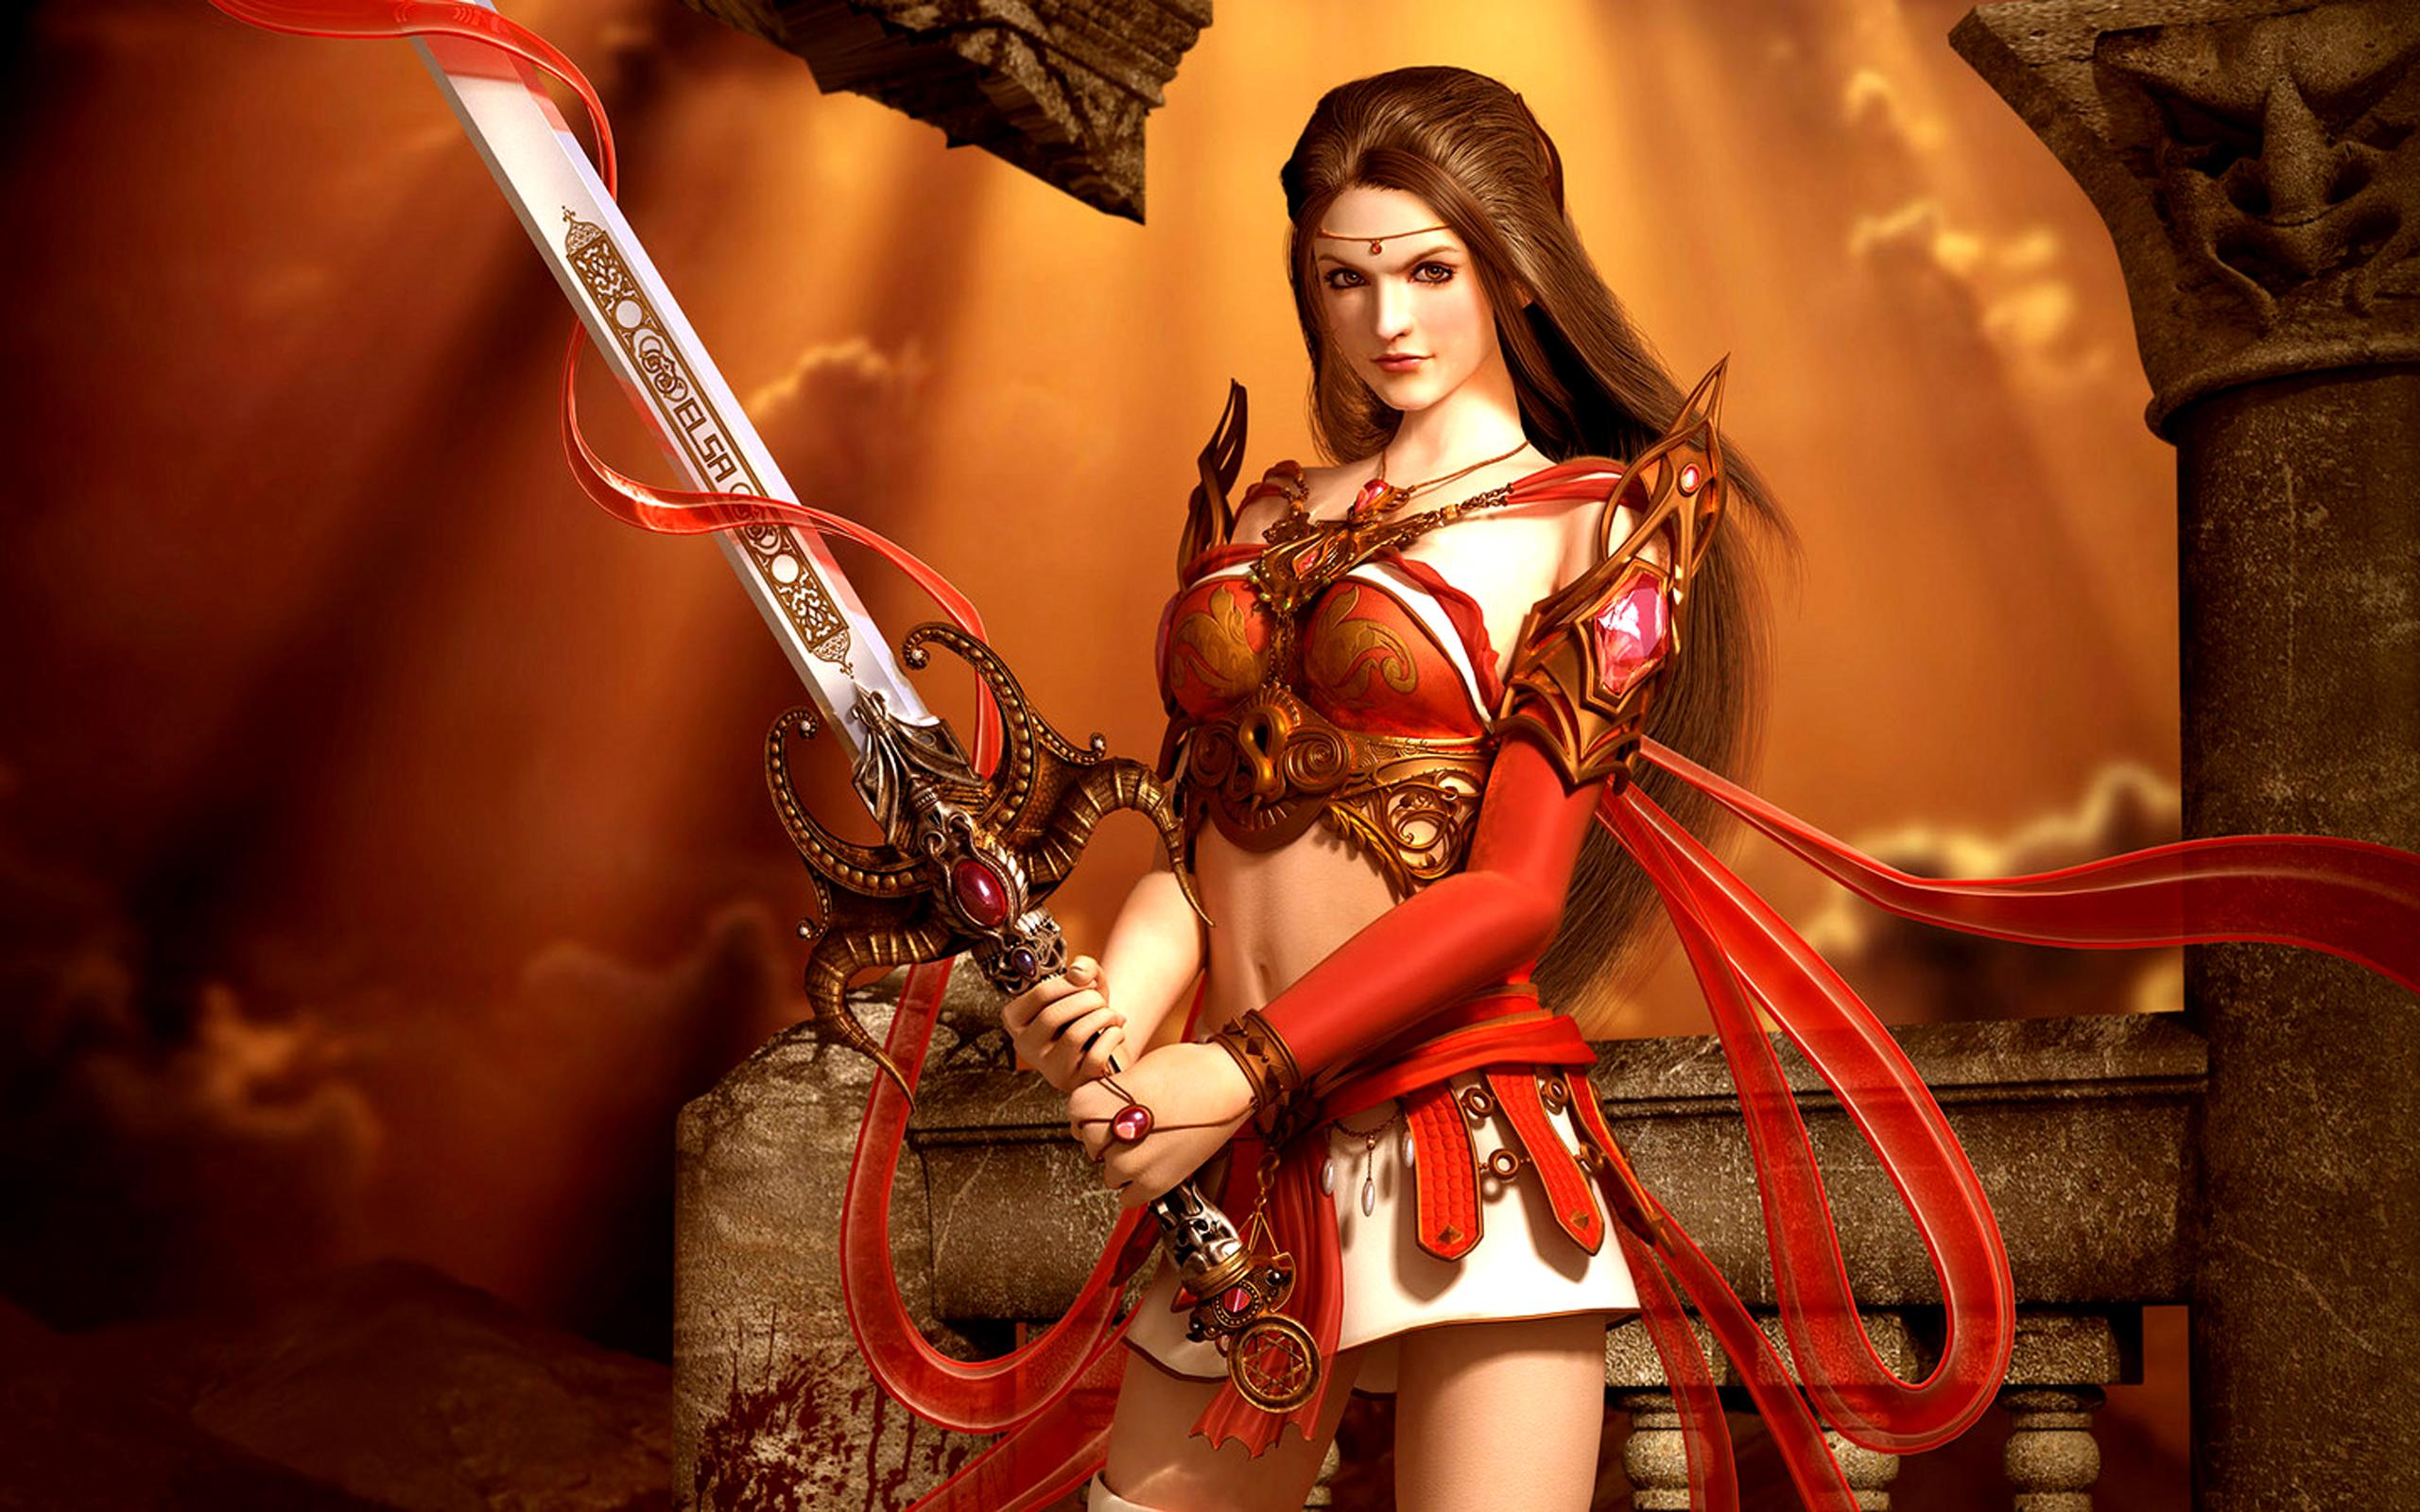 Warrior's Desire